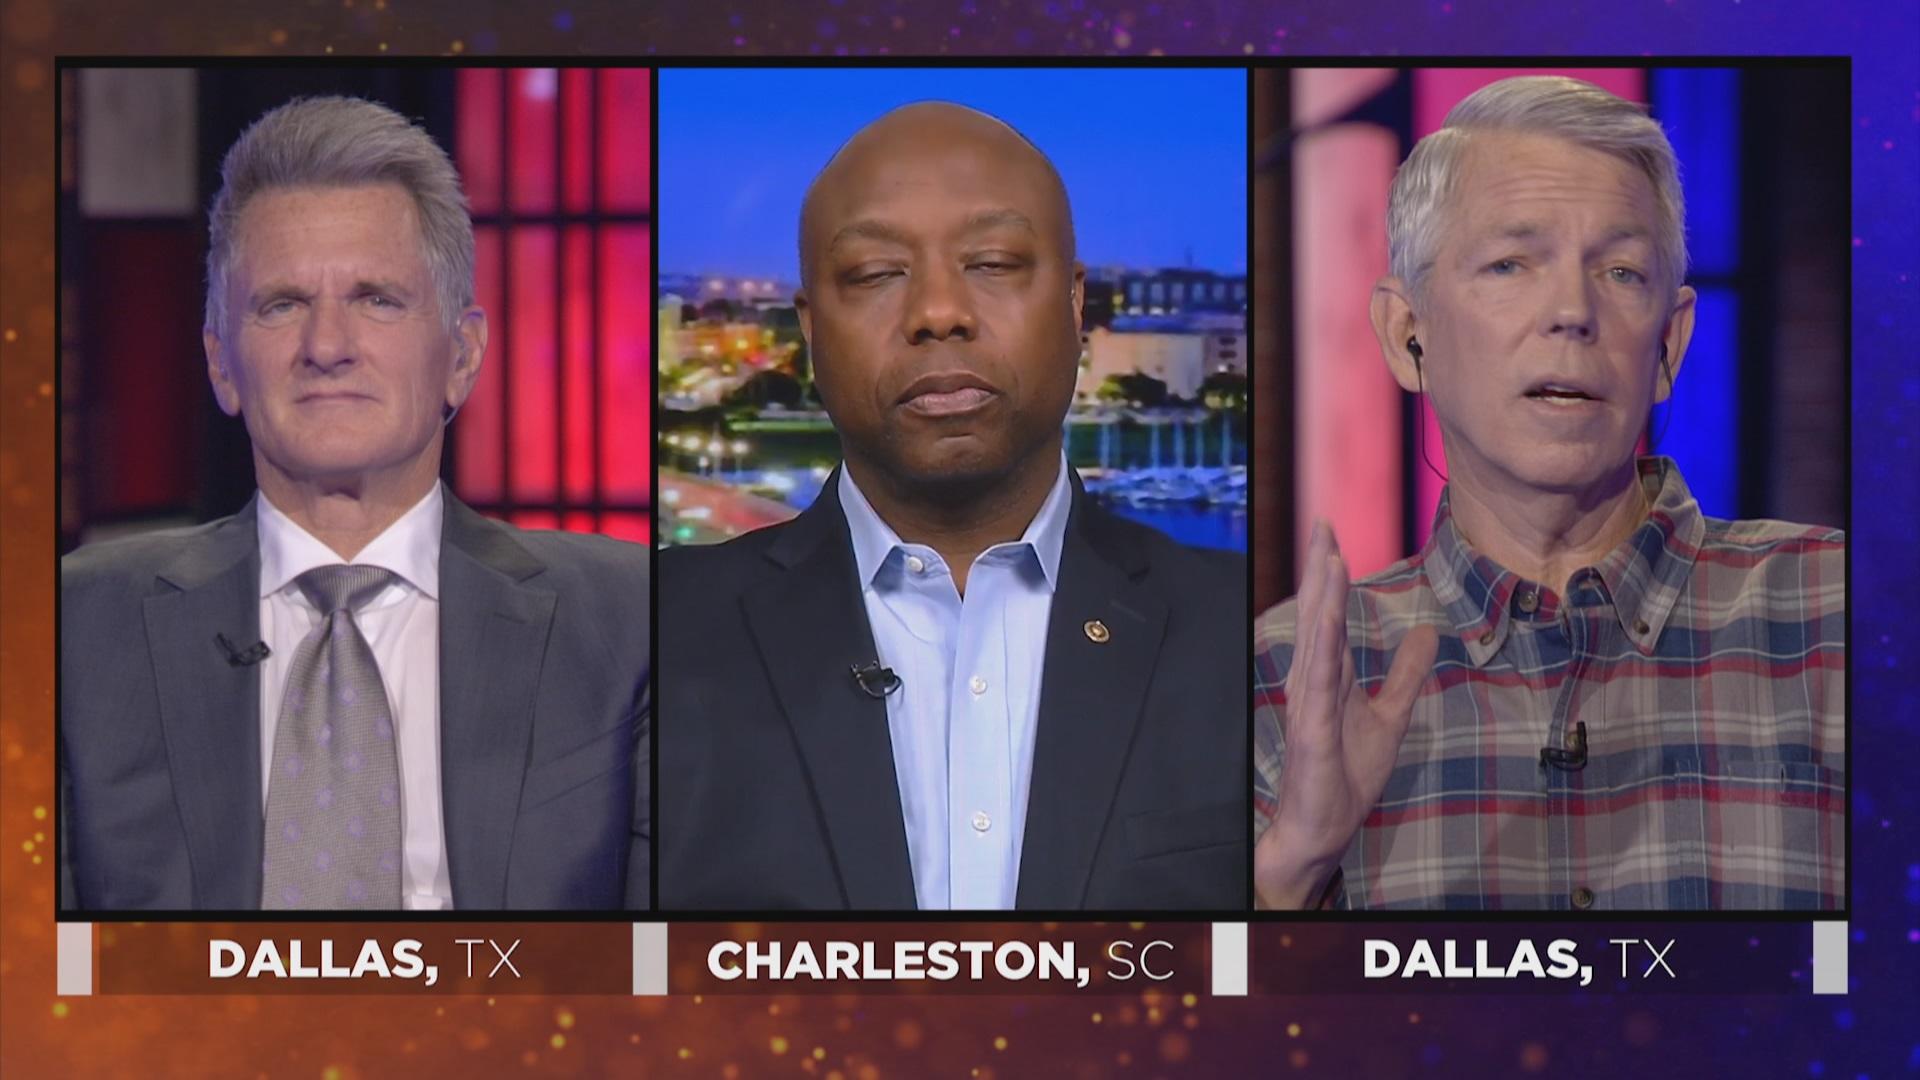 Praise | David Barton, Tim Scott, and Greg Surratt | April 7, 2020